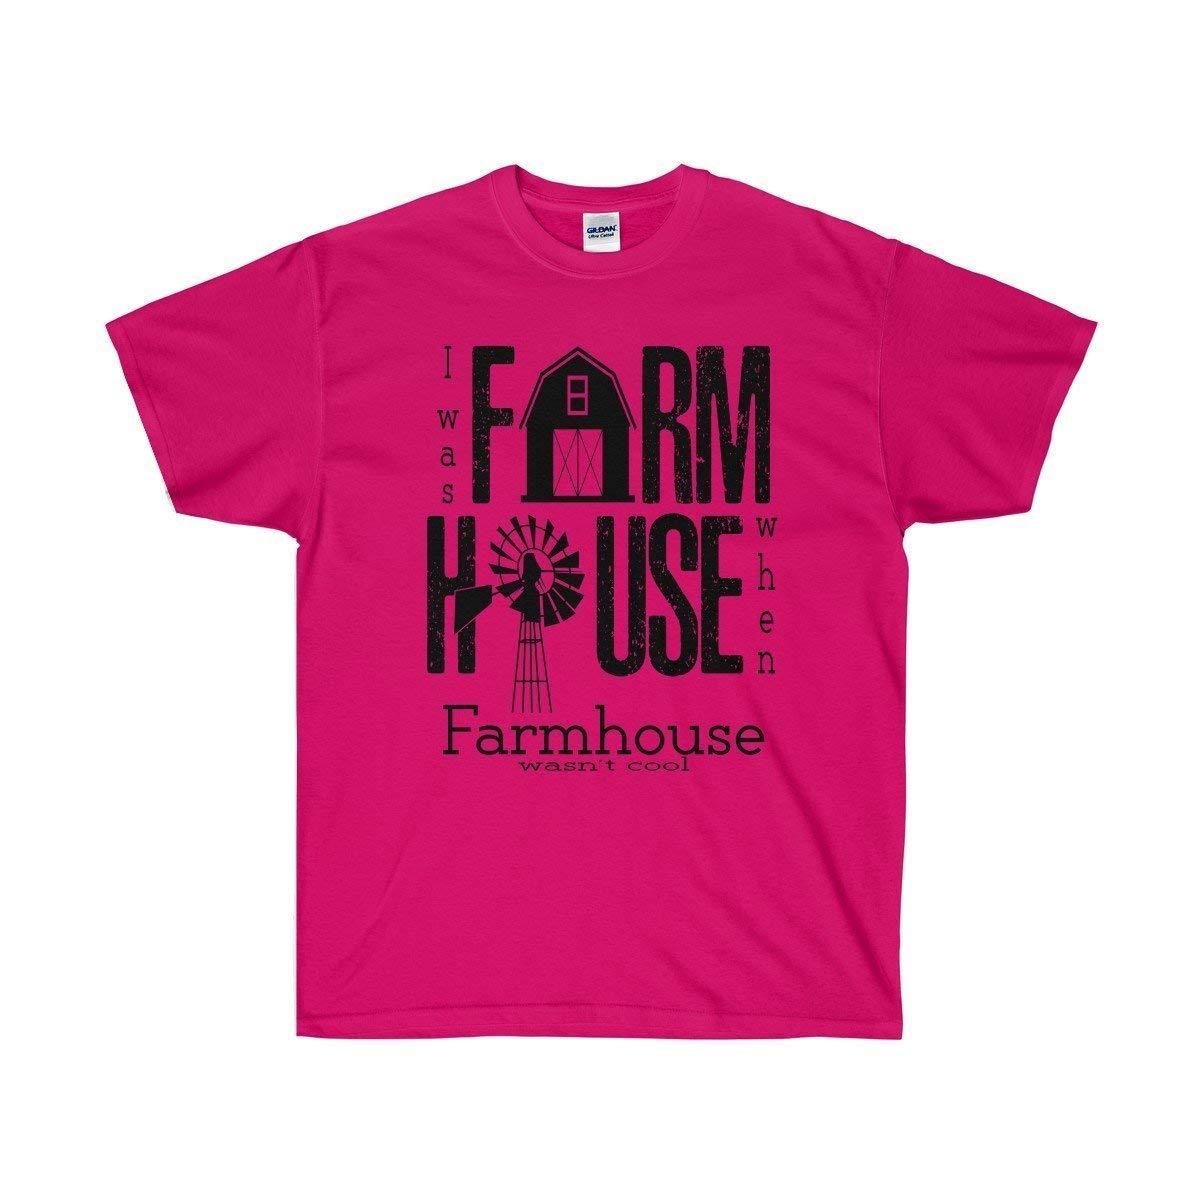 TXRepublic Farmhouse Unisex Ultra Cotton Tee